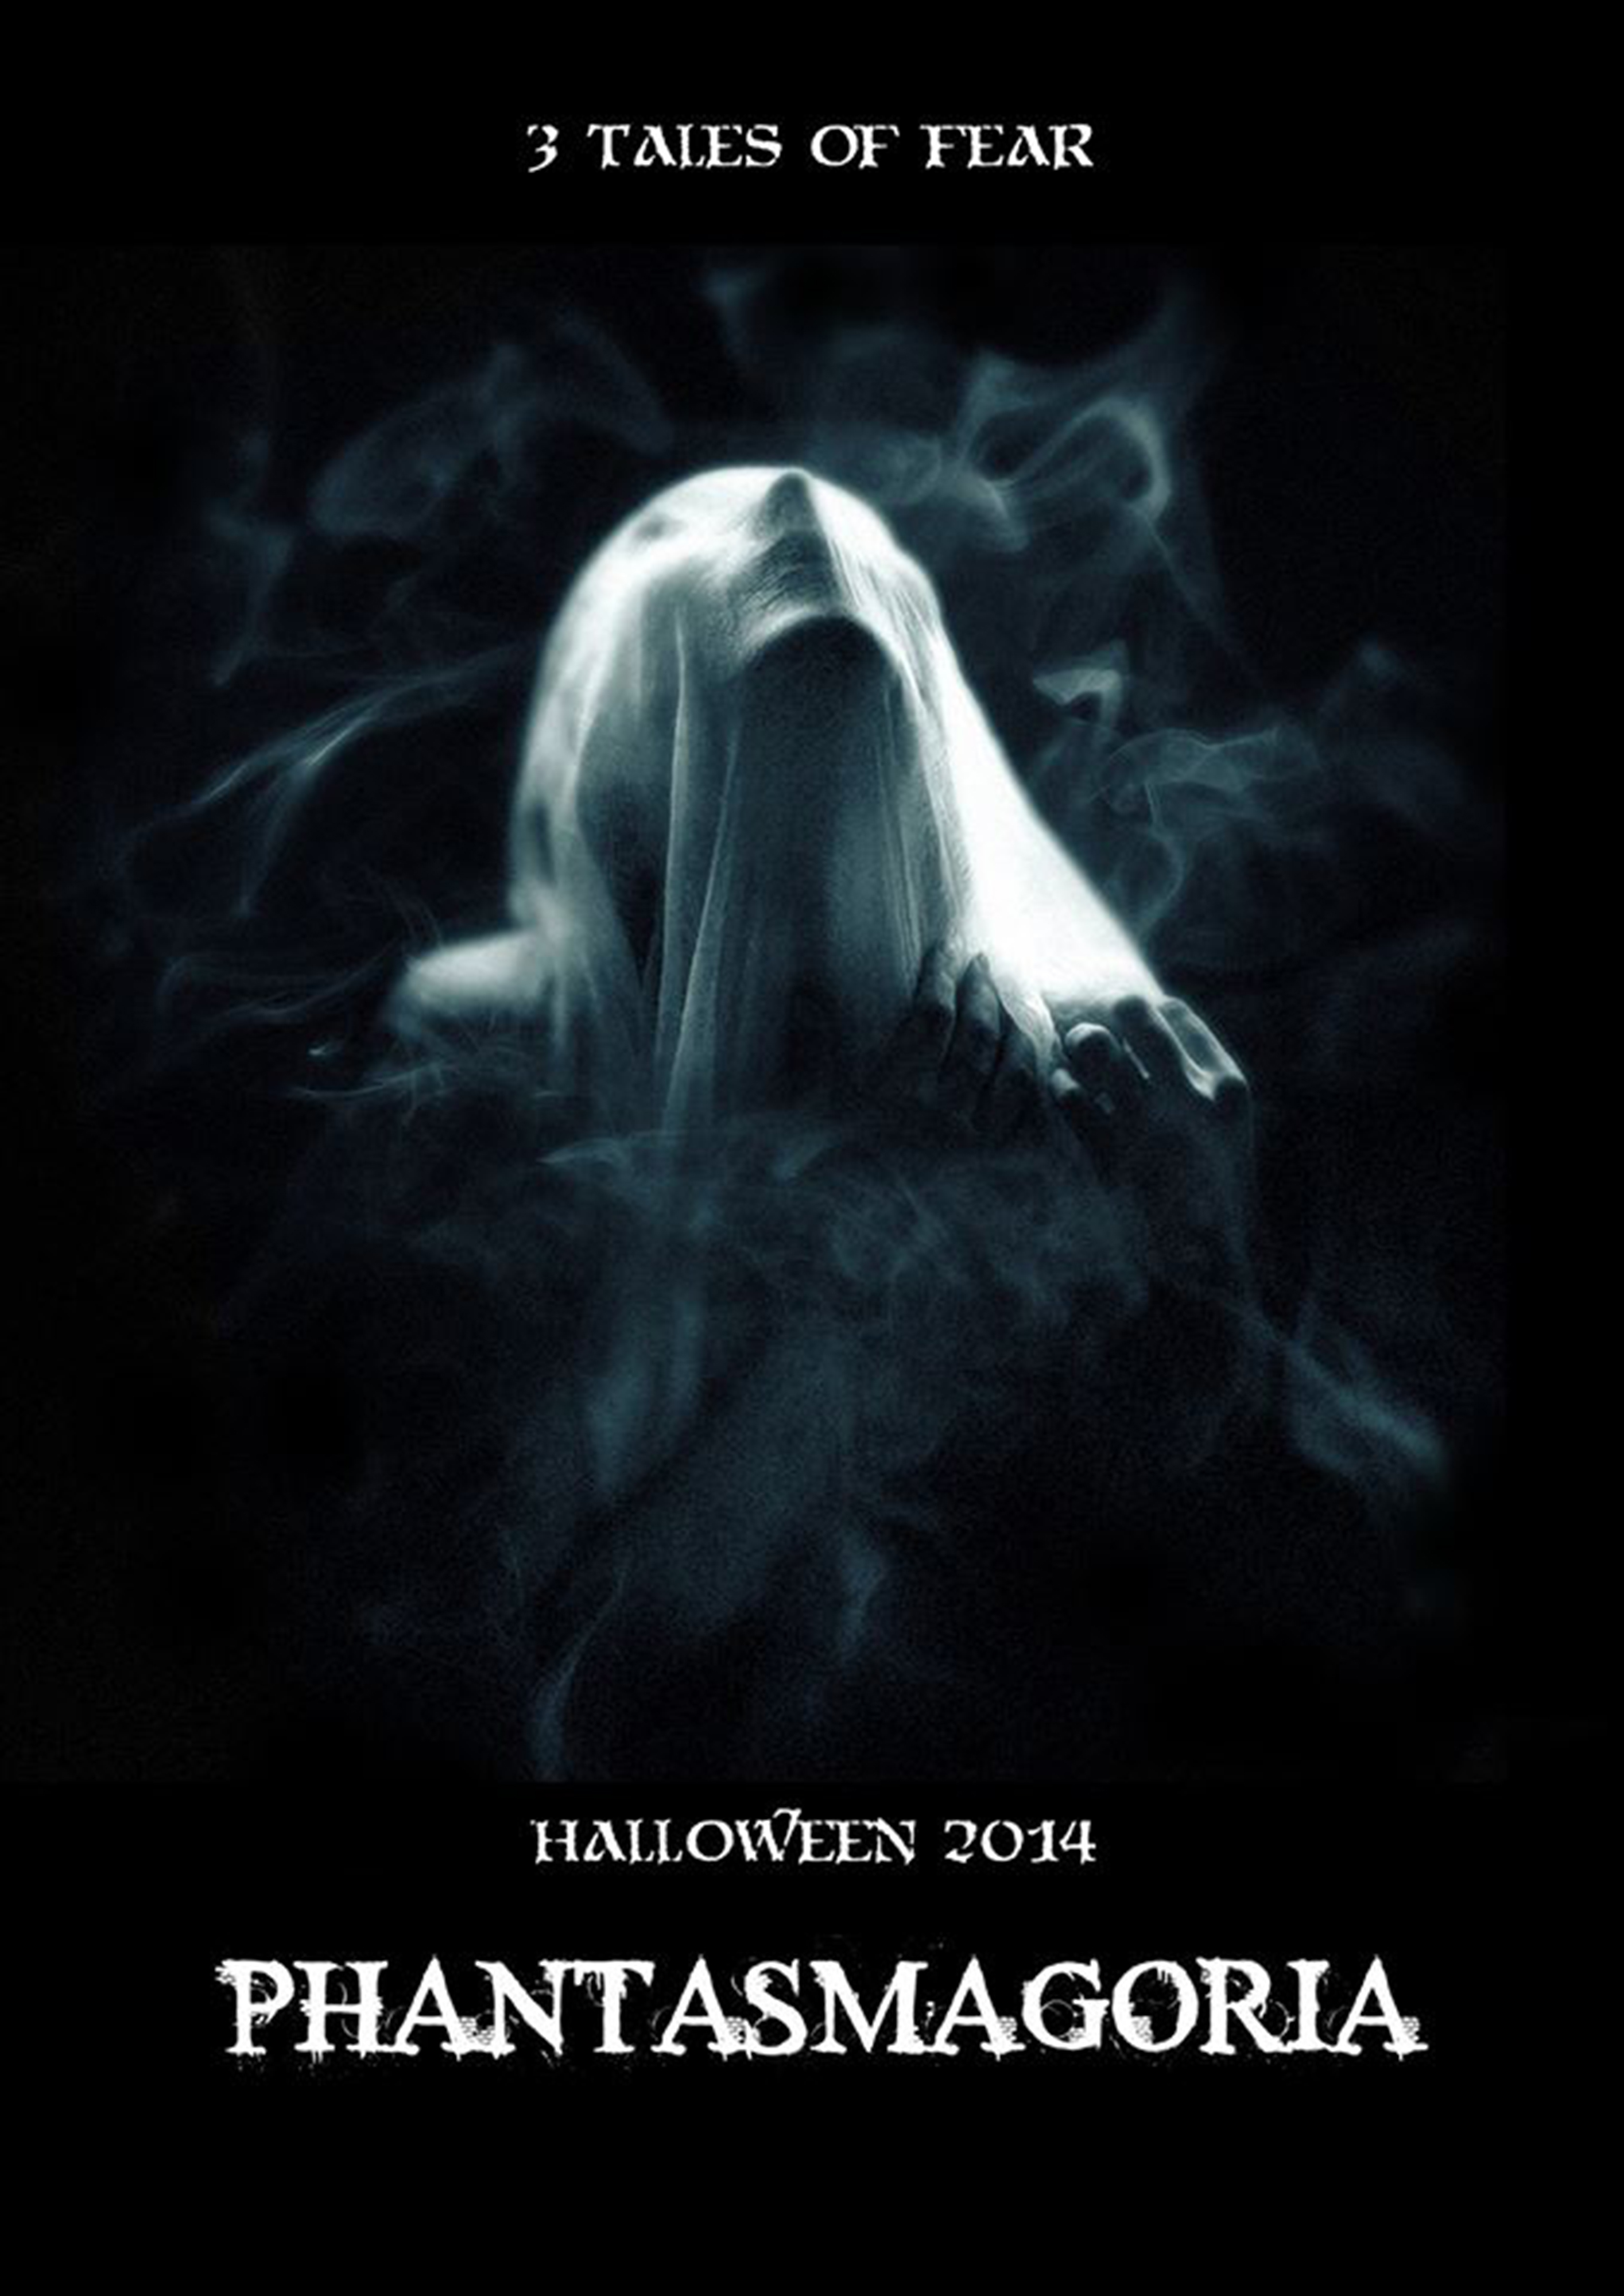 Phantasmagoria_teaser_Poster_HD